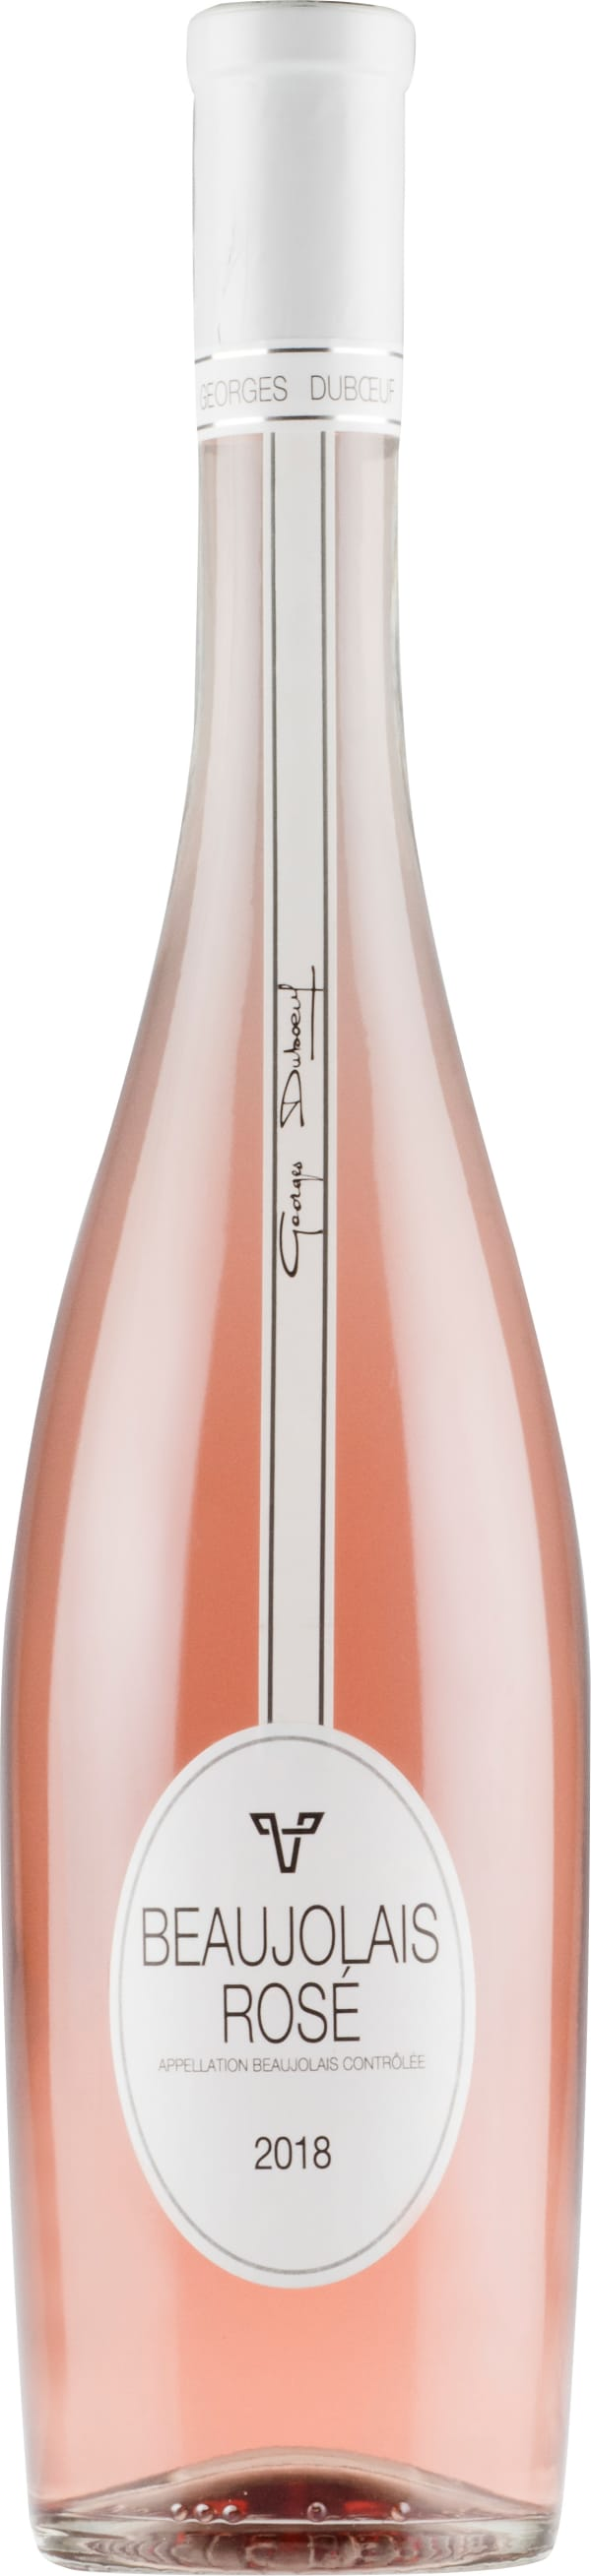 Georges Duboeuf Beaujolais Rosé 2019